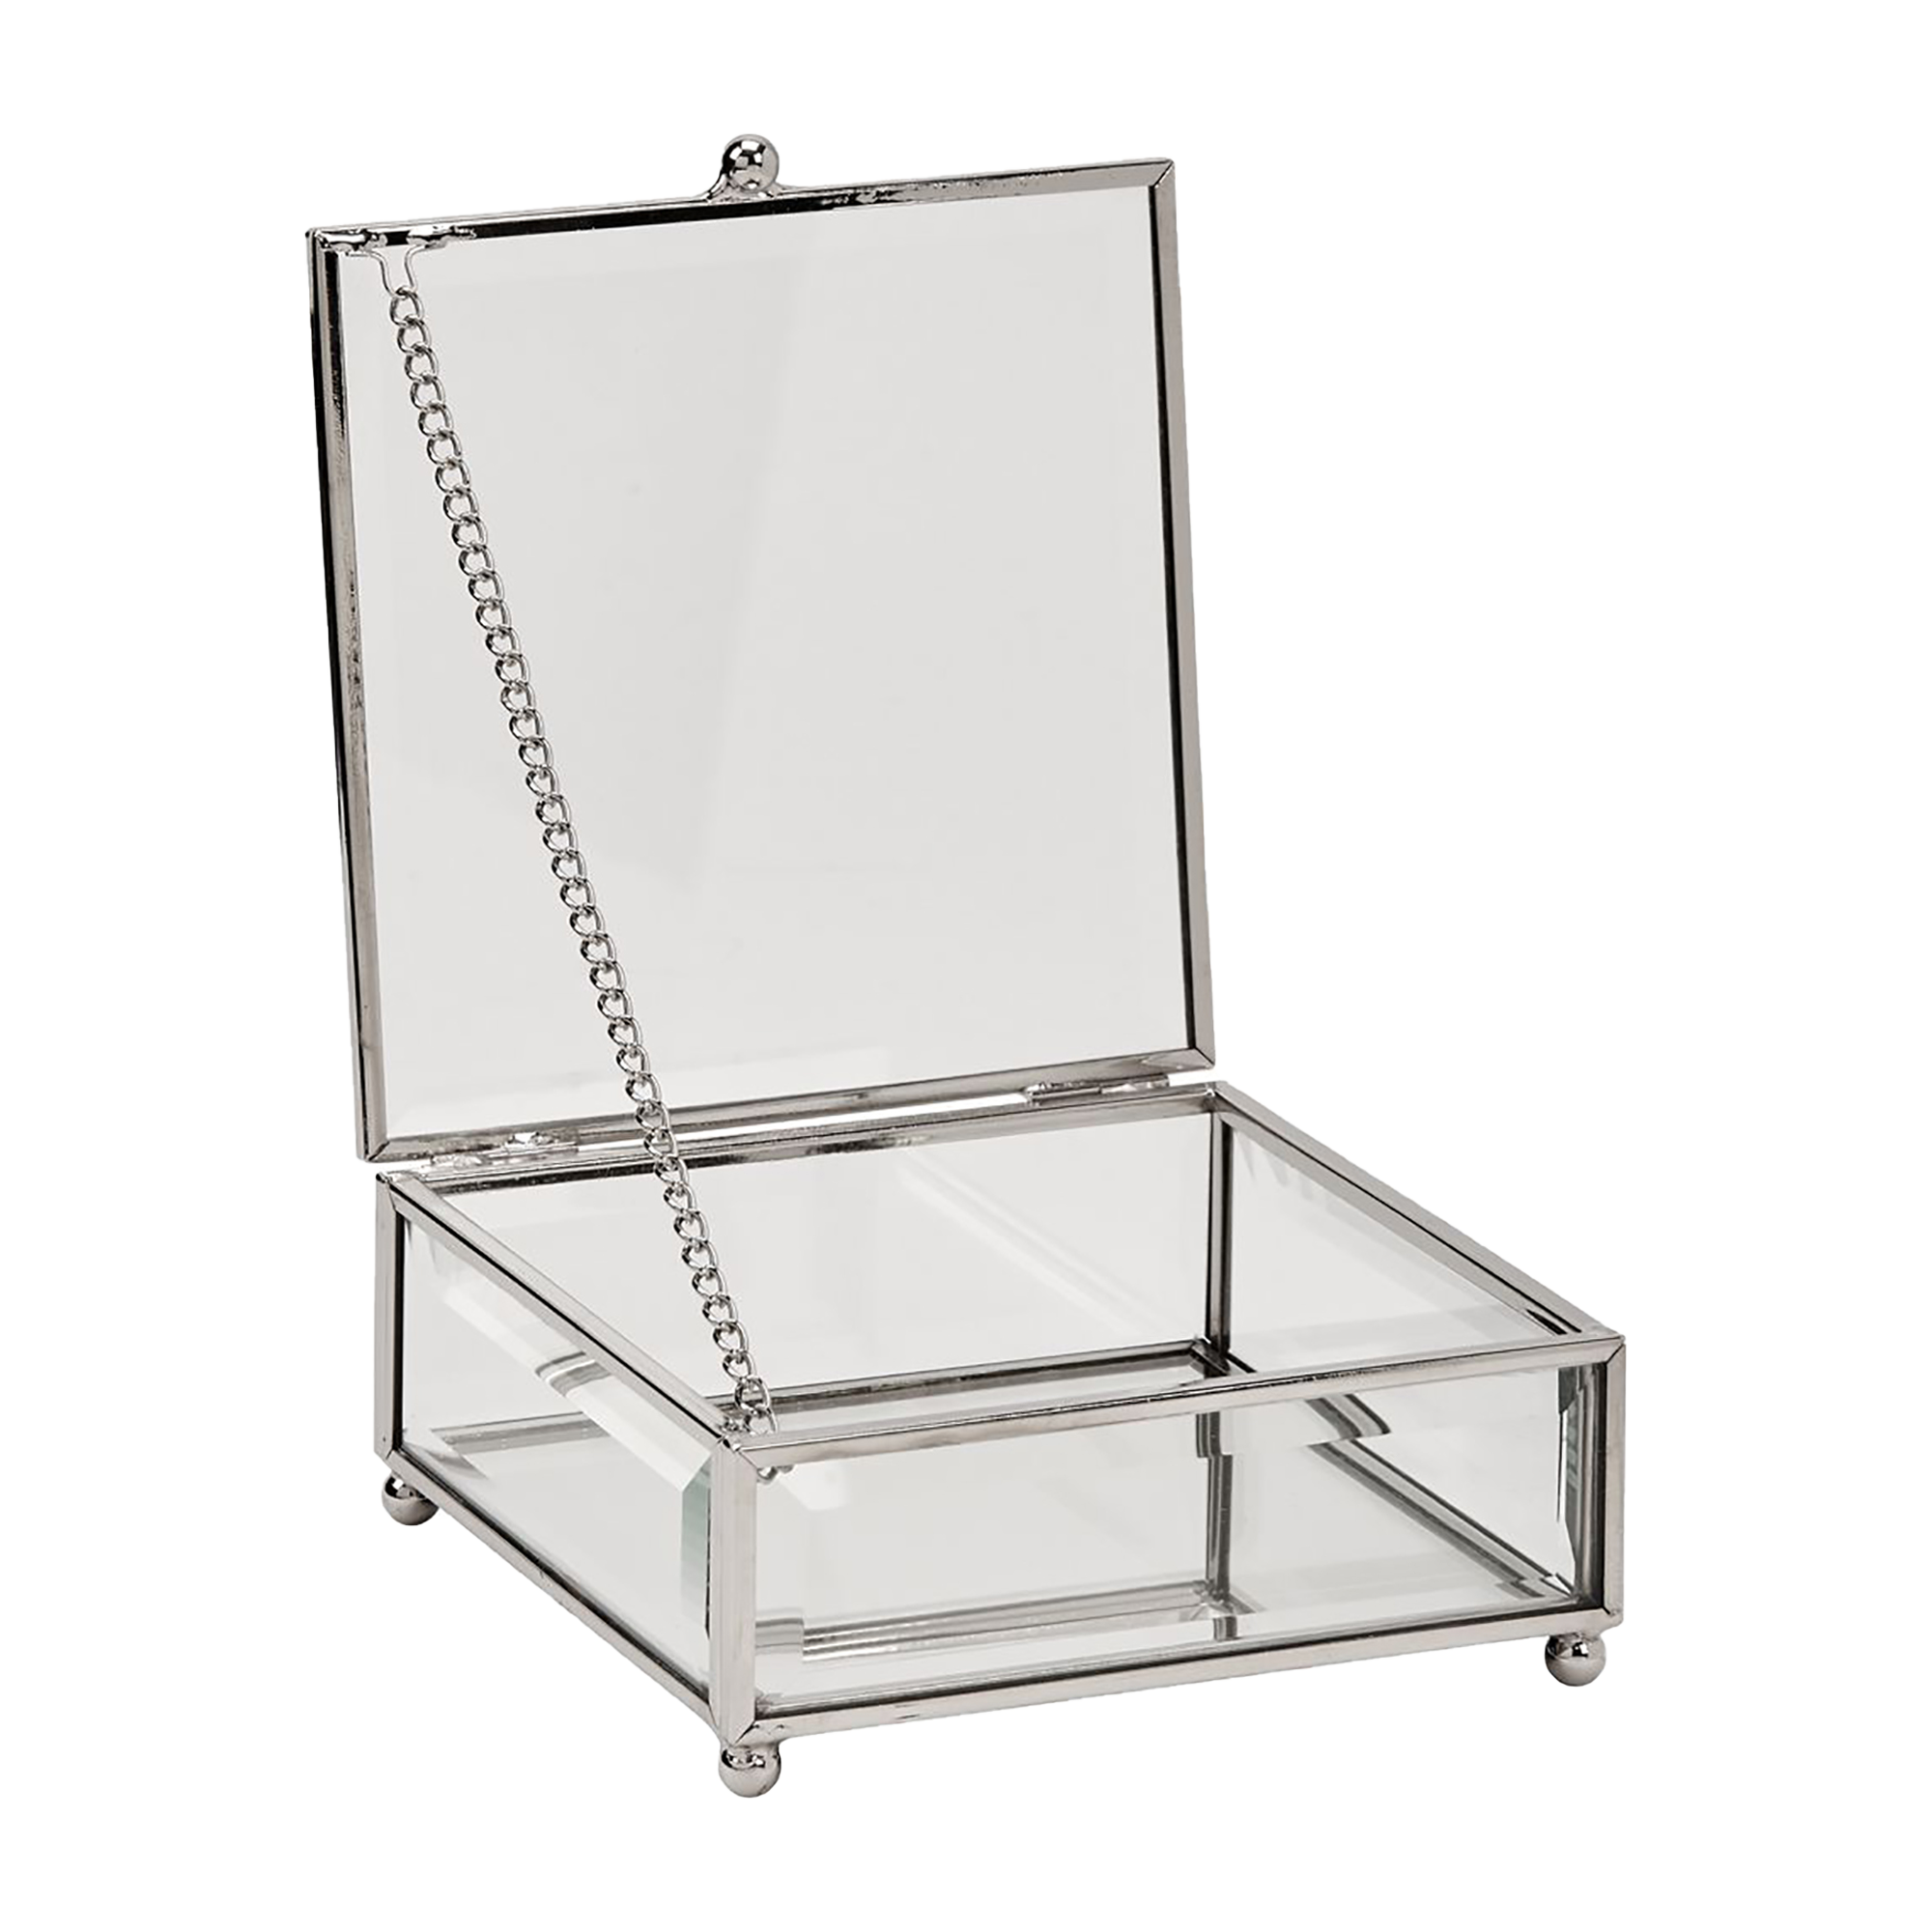 Personalized Glass Jewelry Box